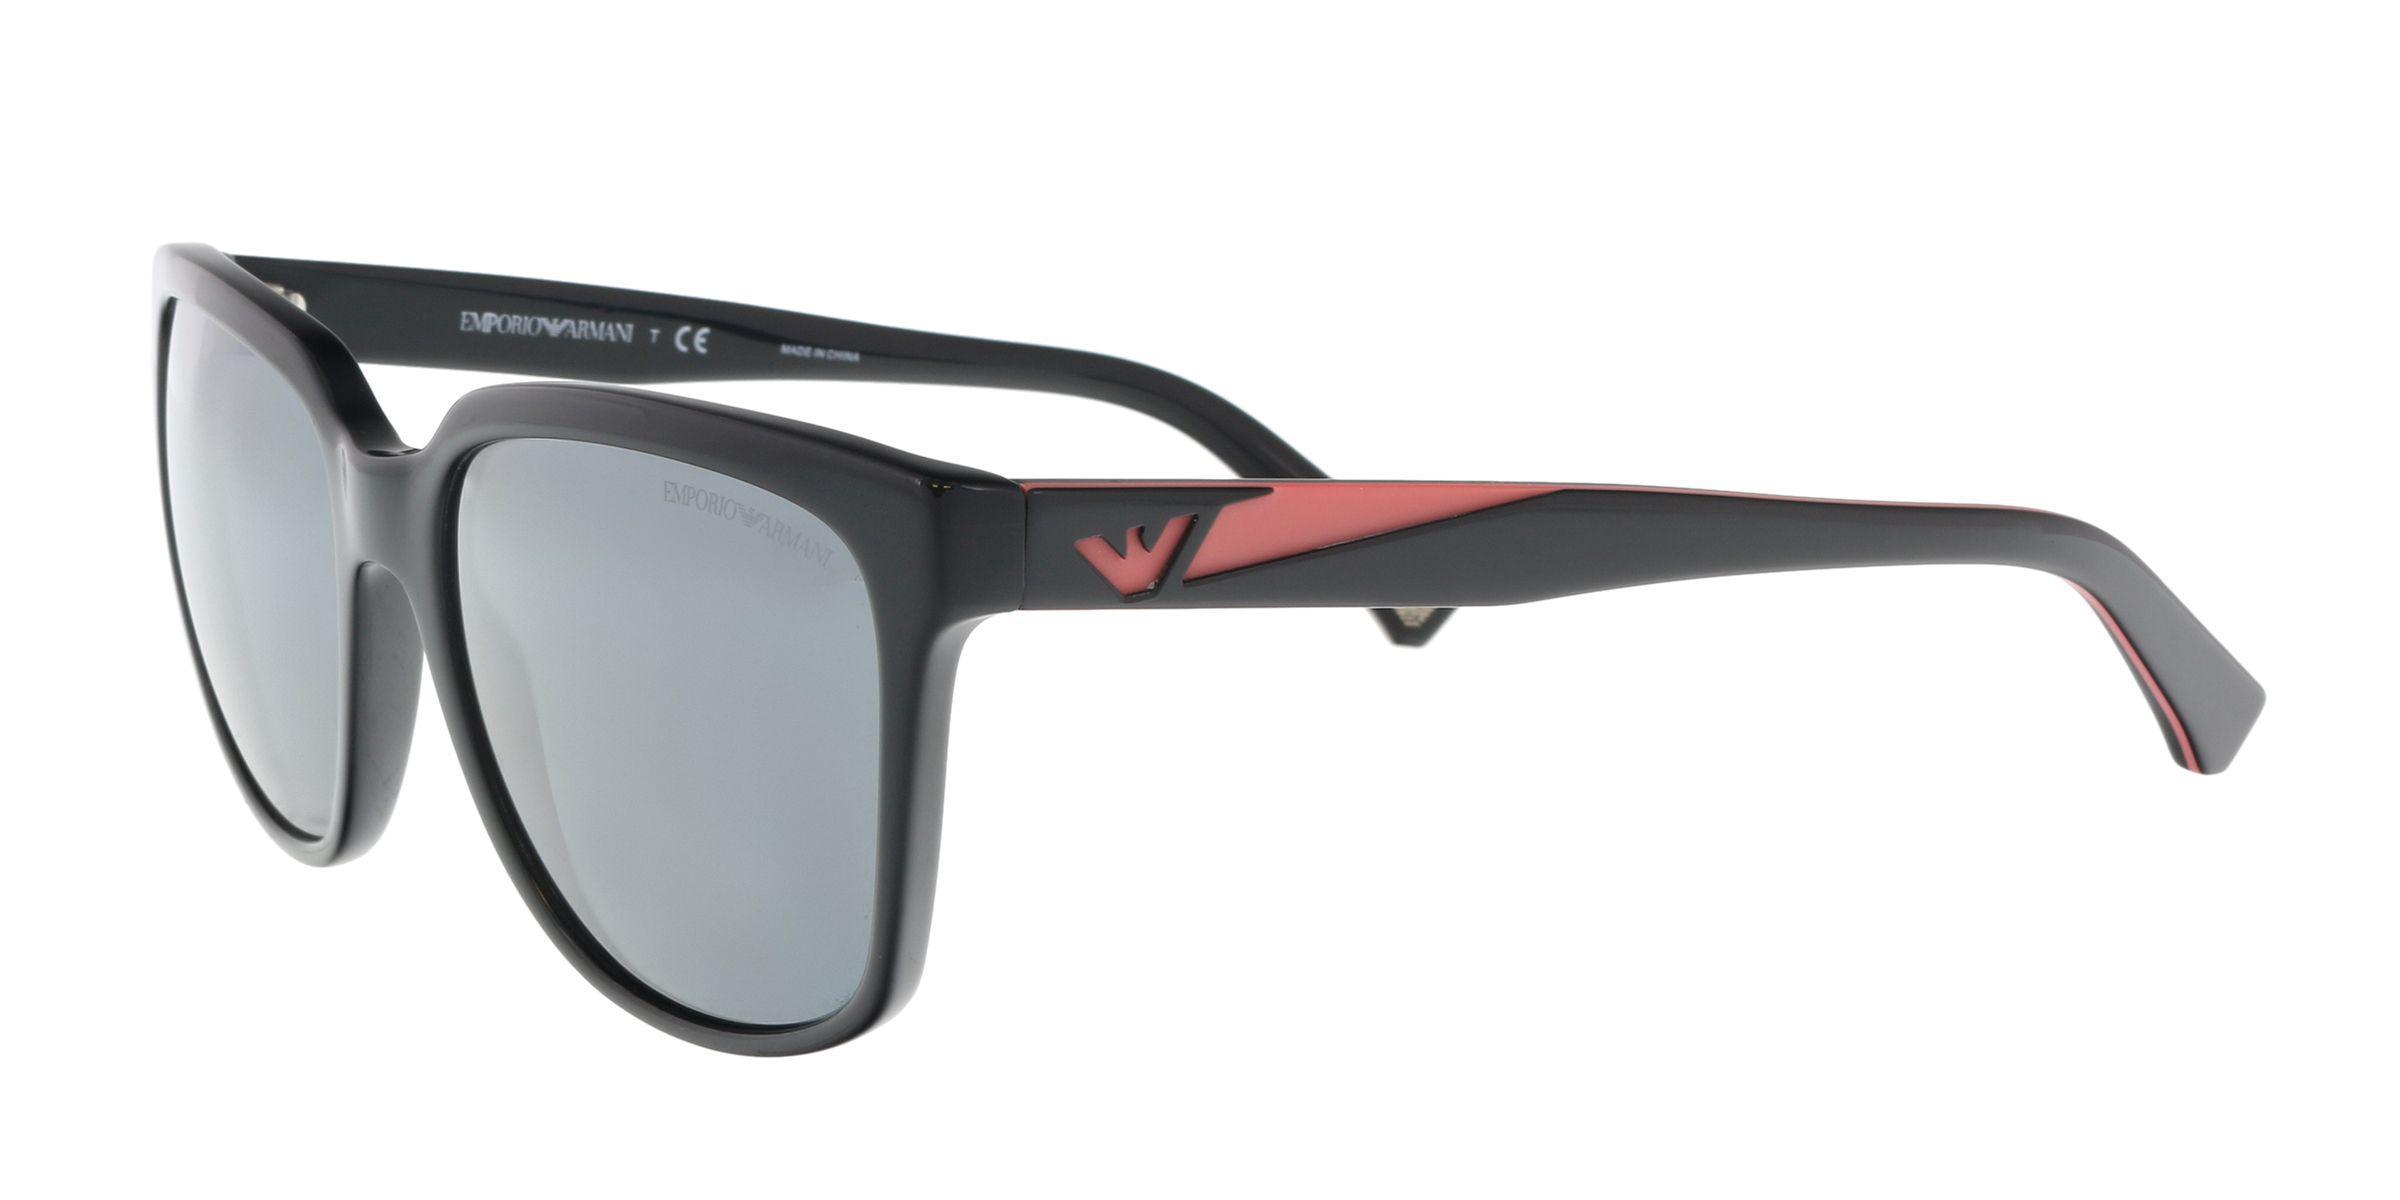 3eecdd0169b Lyst - Emporio Armani Ea4070 50176g Black pink Cat Eye Sunglasses in ...